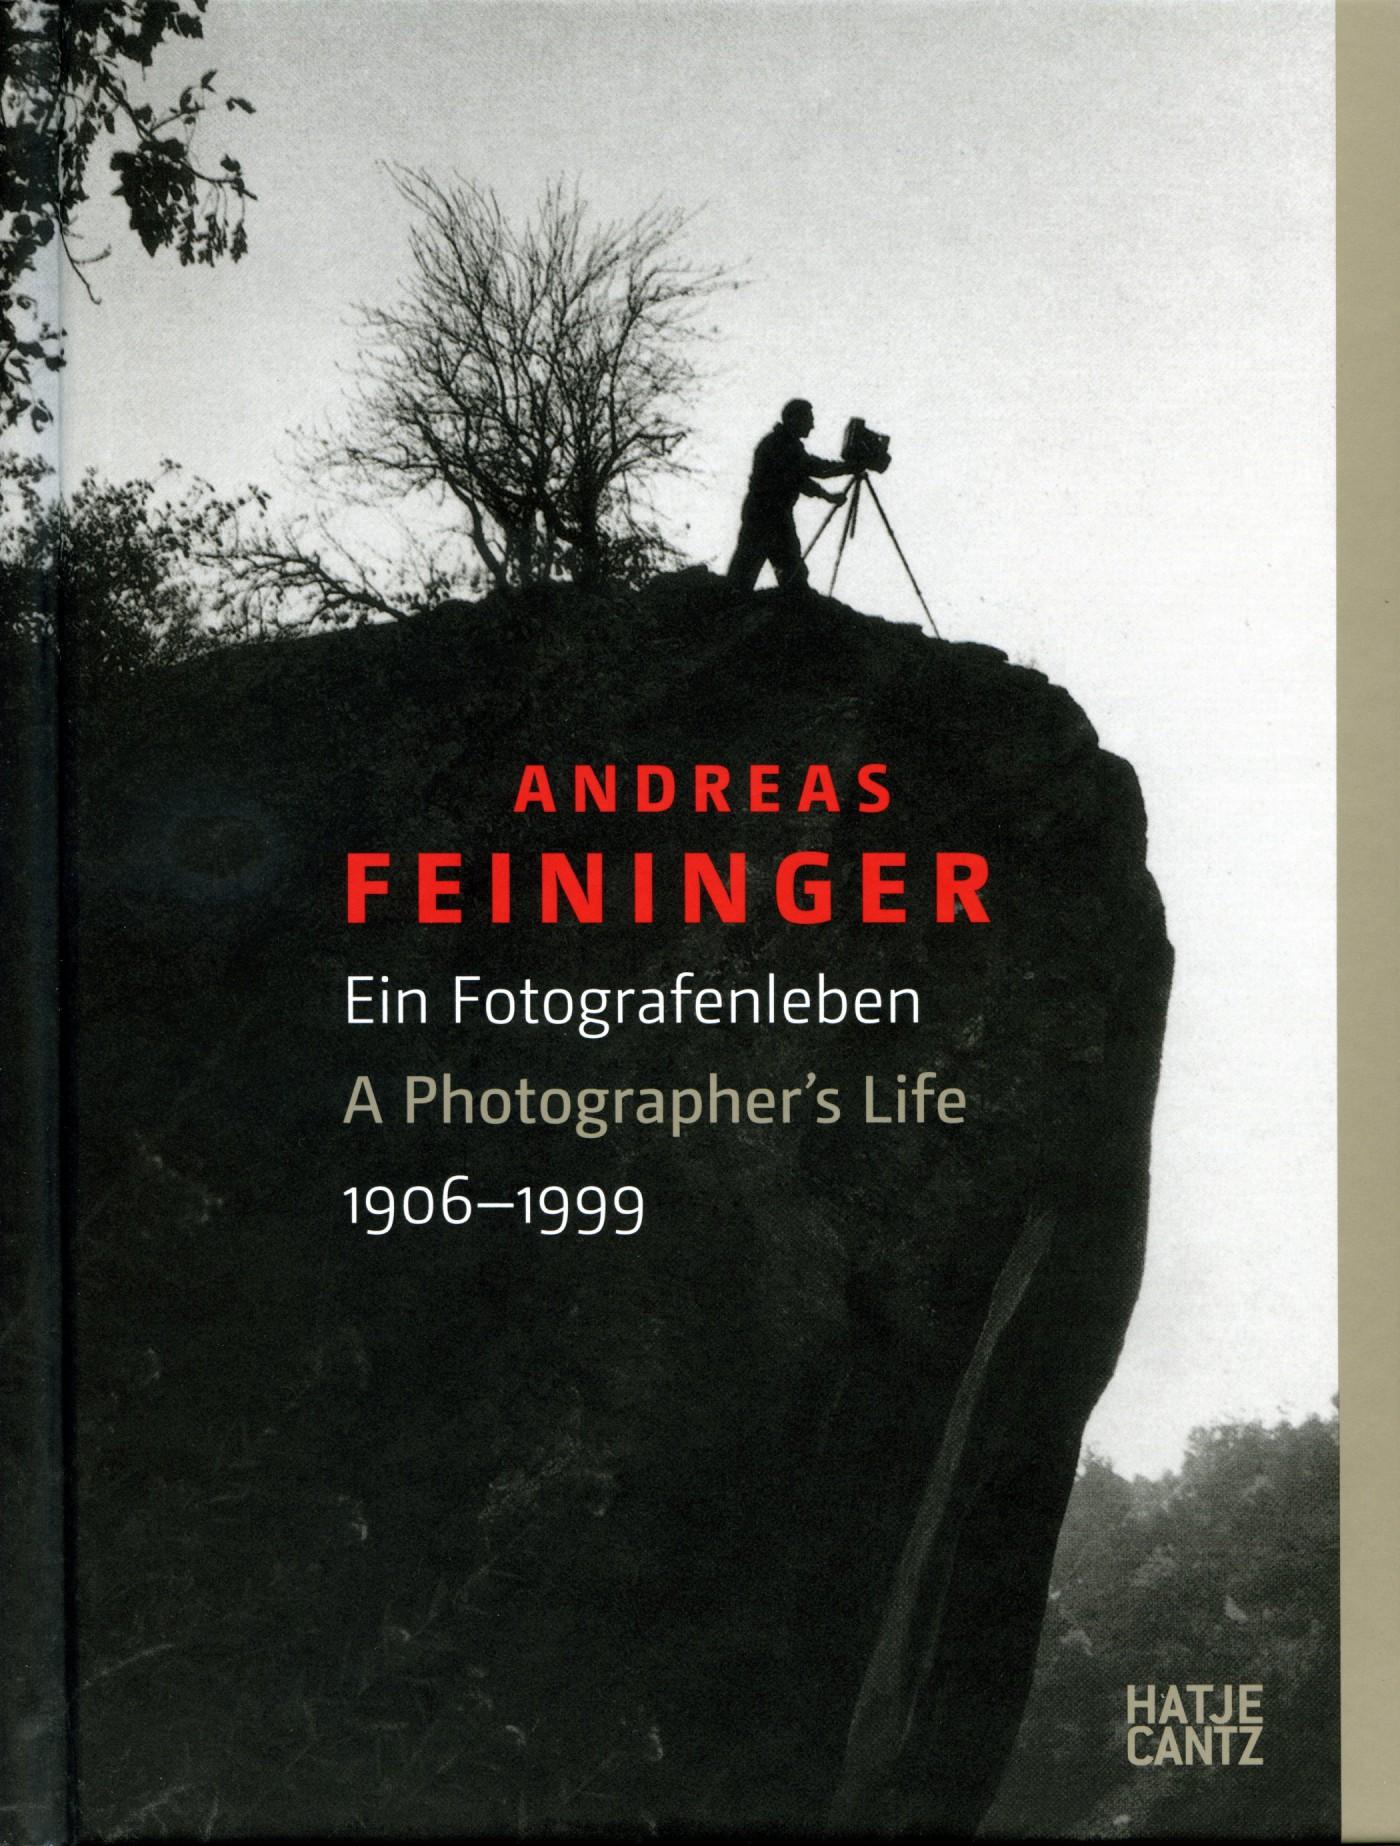 Andreas Feininger - Ein Fotografenleben